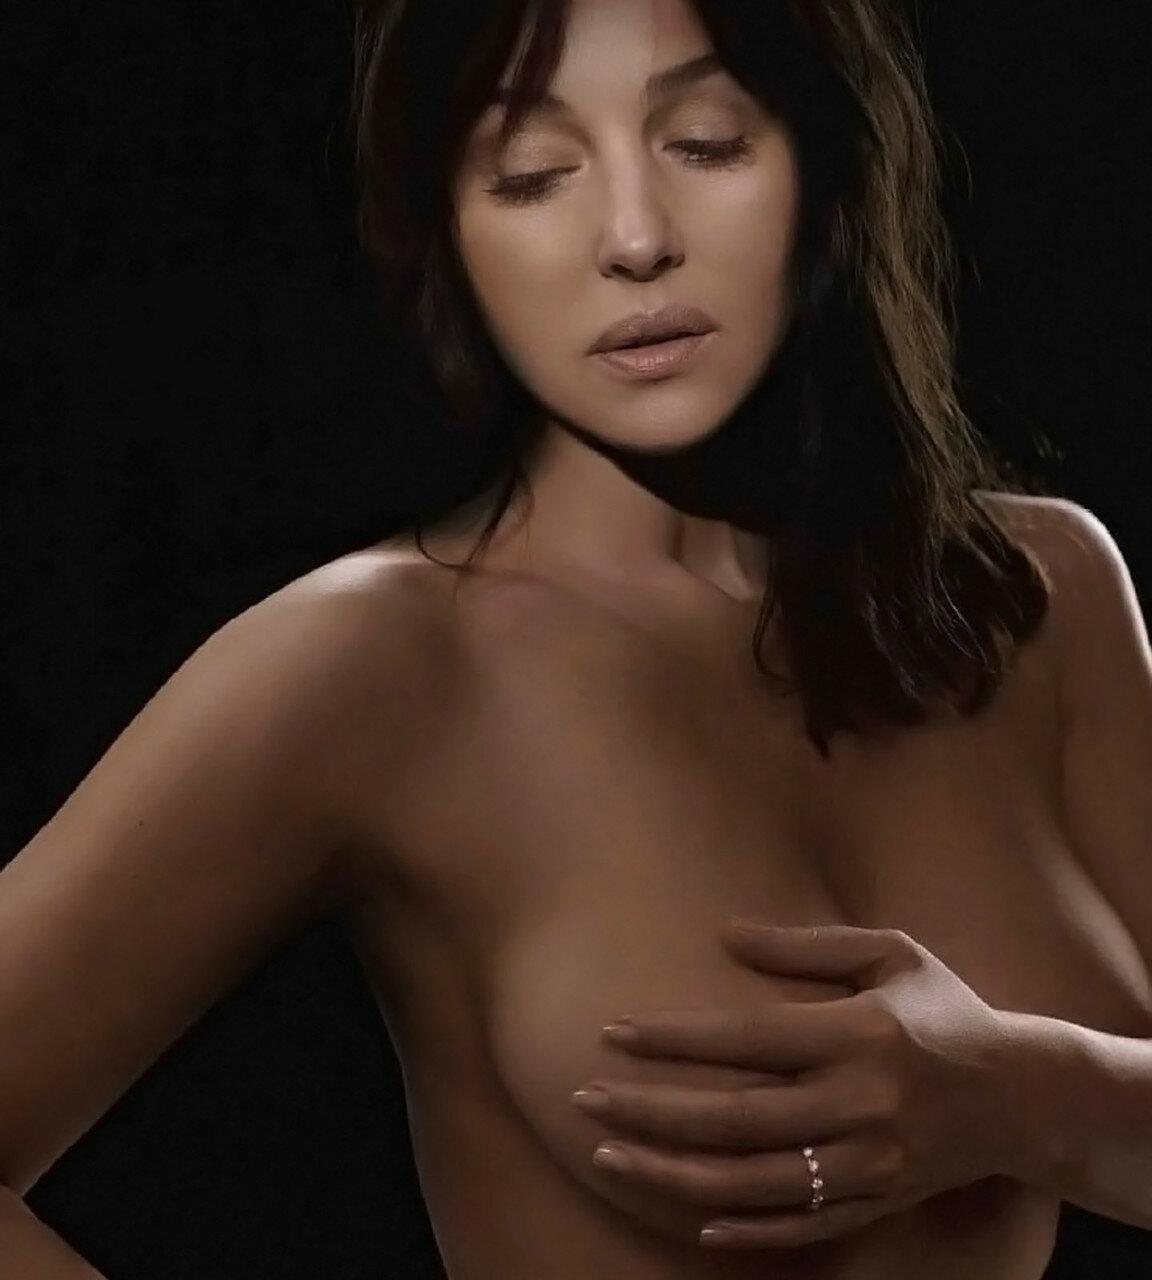 Филем онлаен отрывок эротика моники белуччи 23 фотография